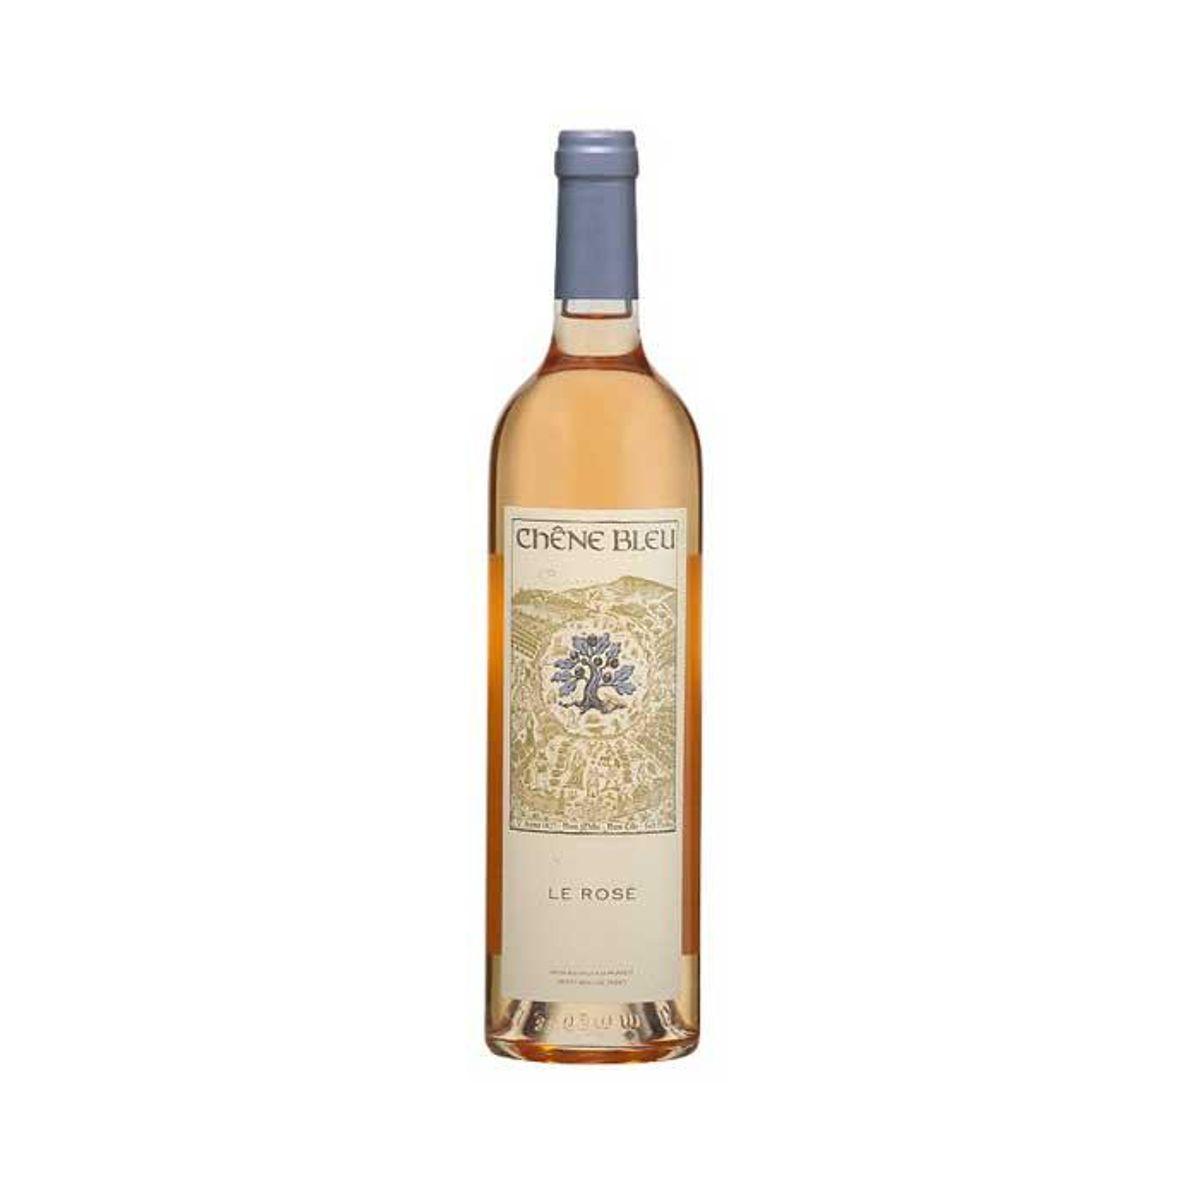 chene bleu rose igp vaucluse 2018